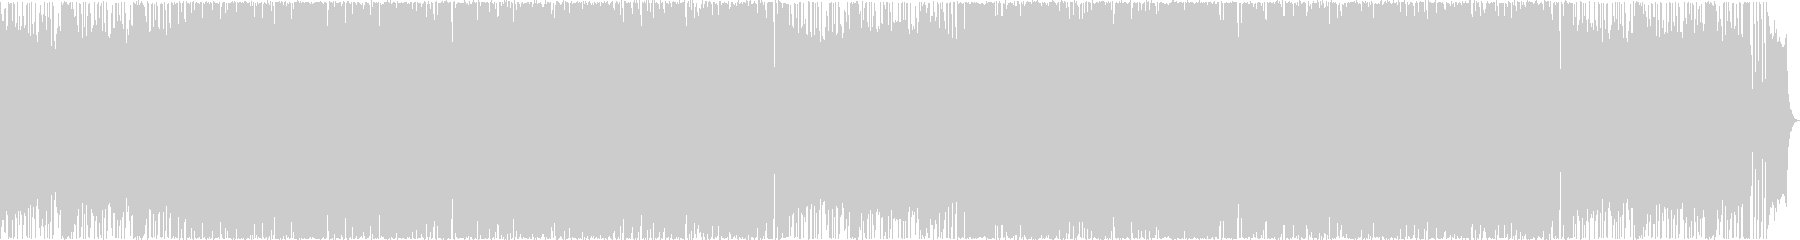 EWIメロディーの16ビートフュージョンの未再生の波形